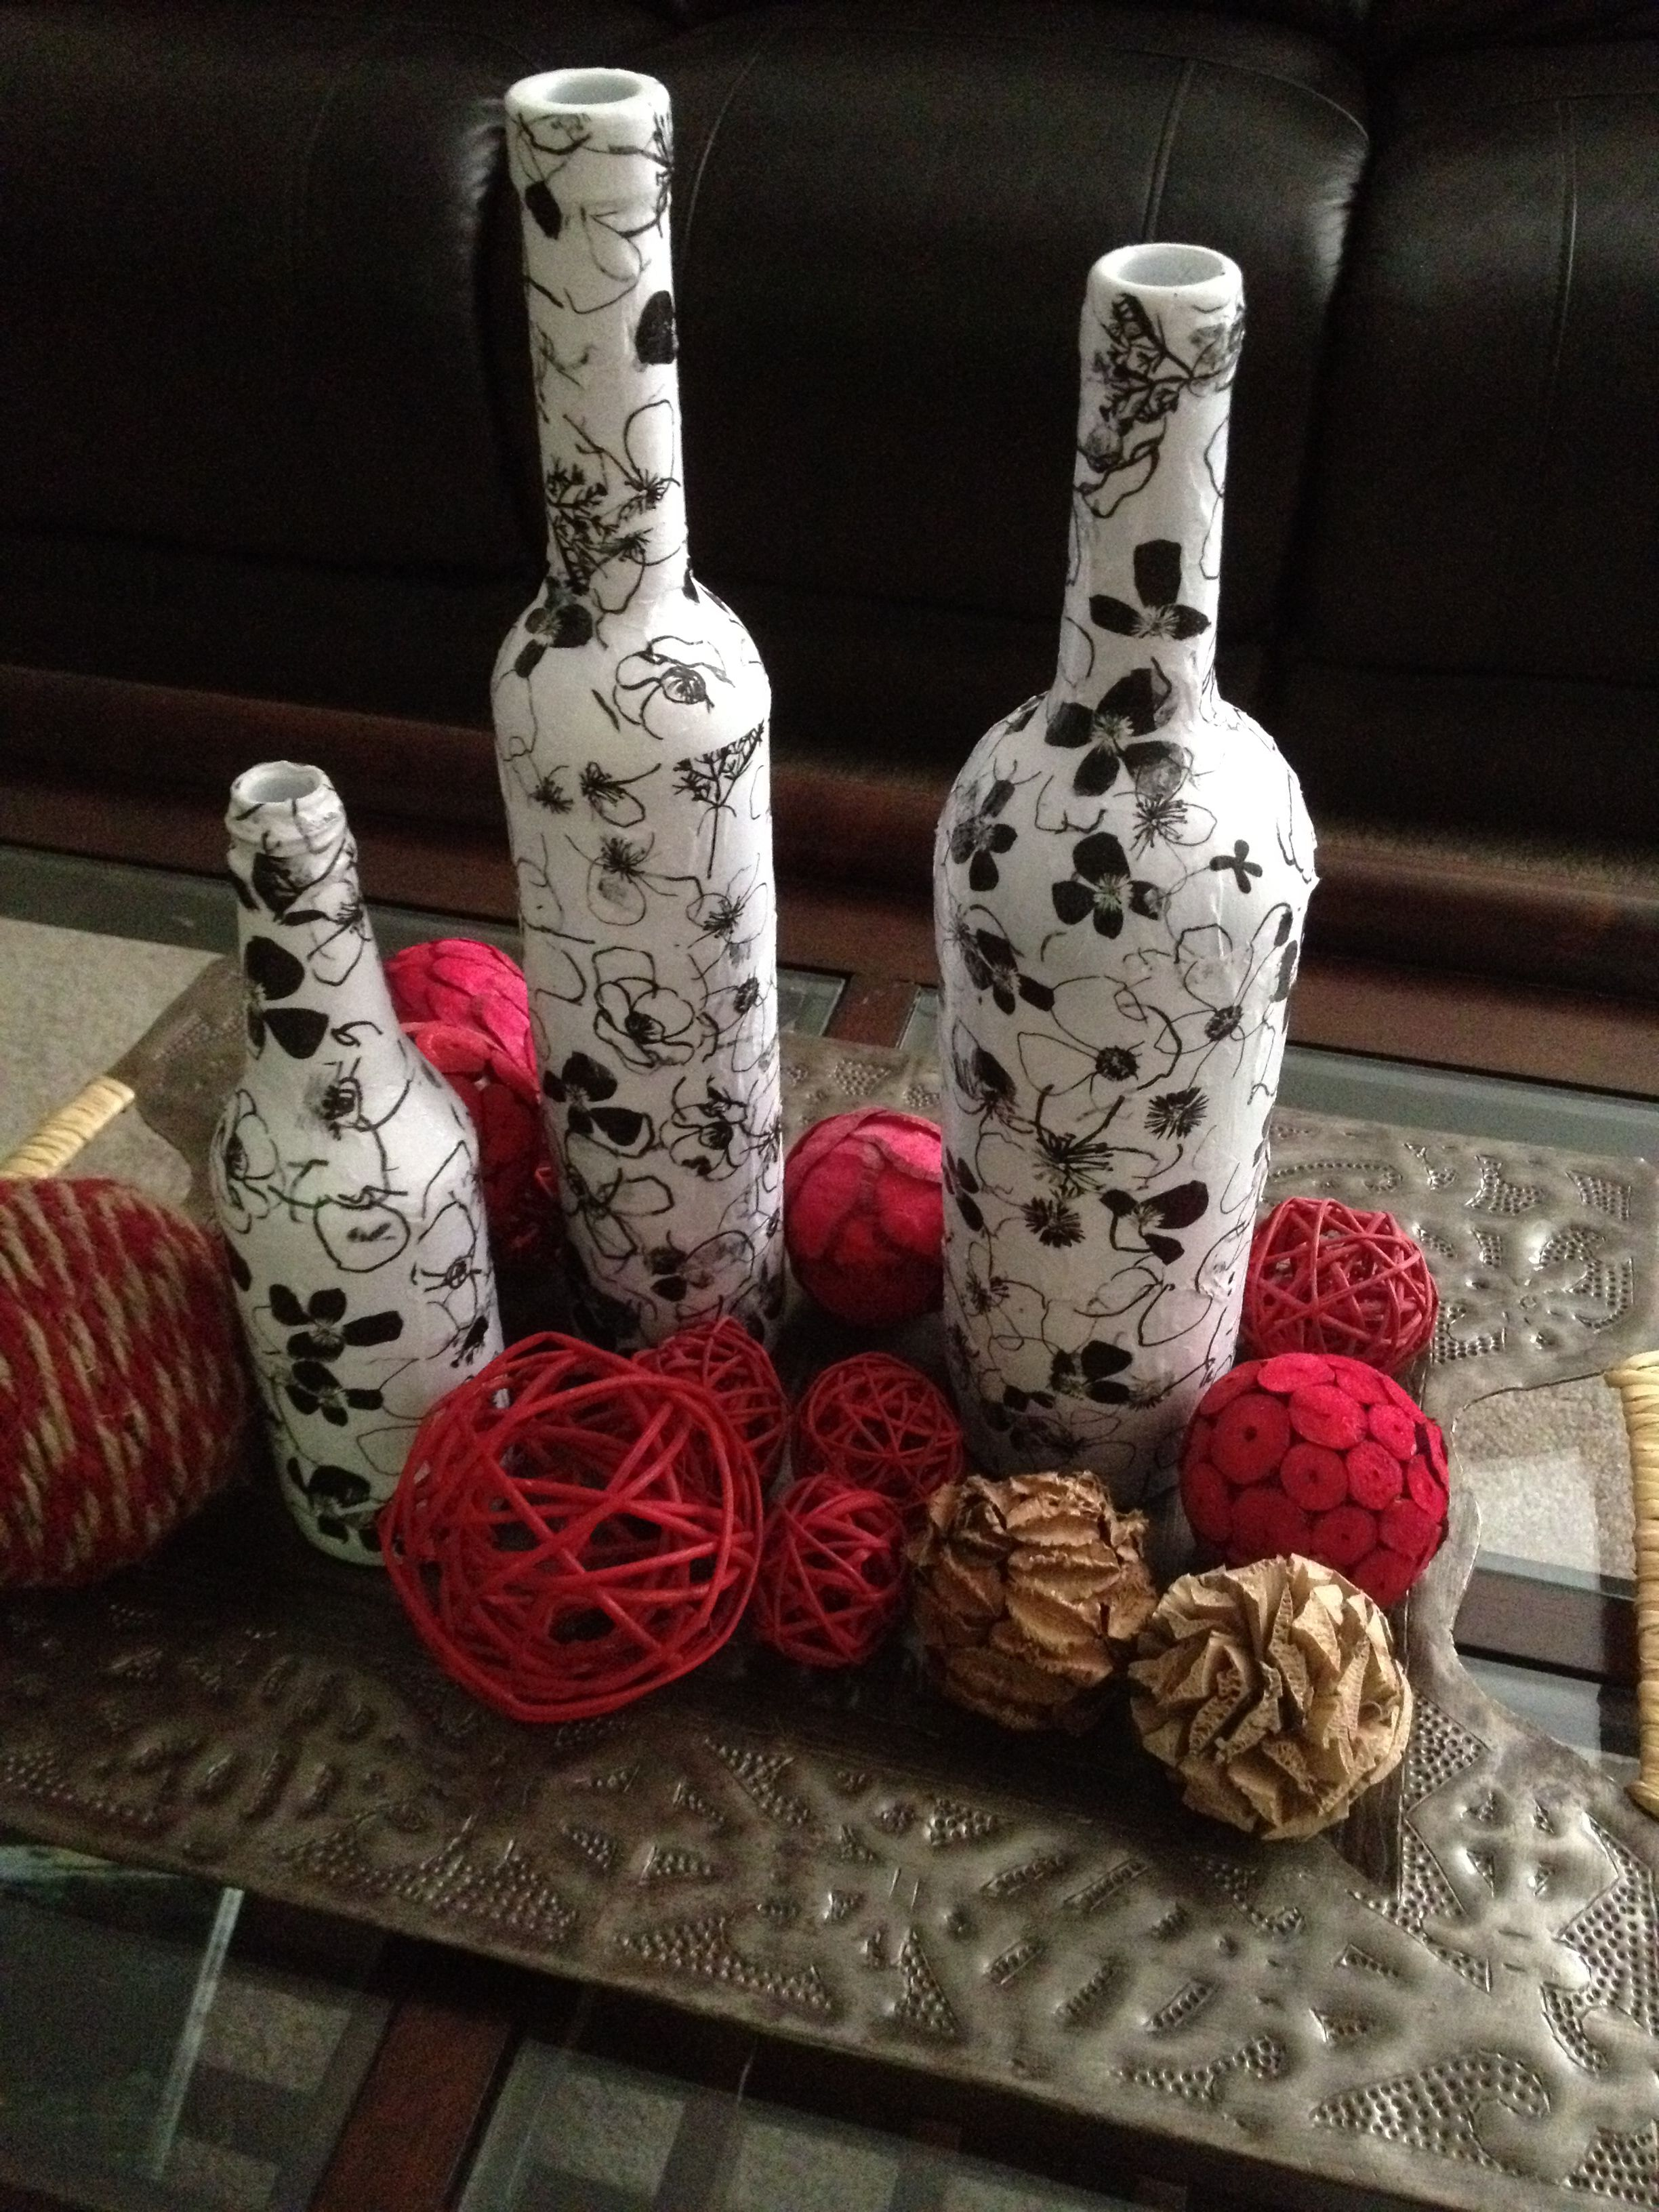 Cara Young Wine Bottle Craft Wine Bottle Crafts Bottle Crafts Glass Bottle Crafts